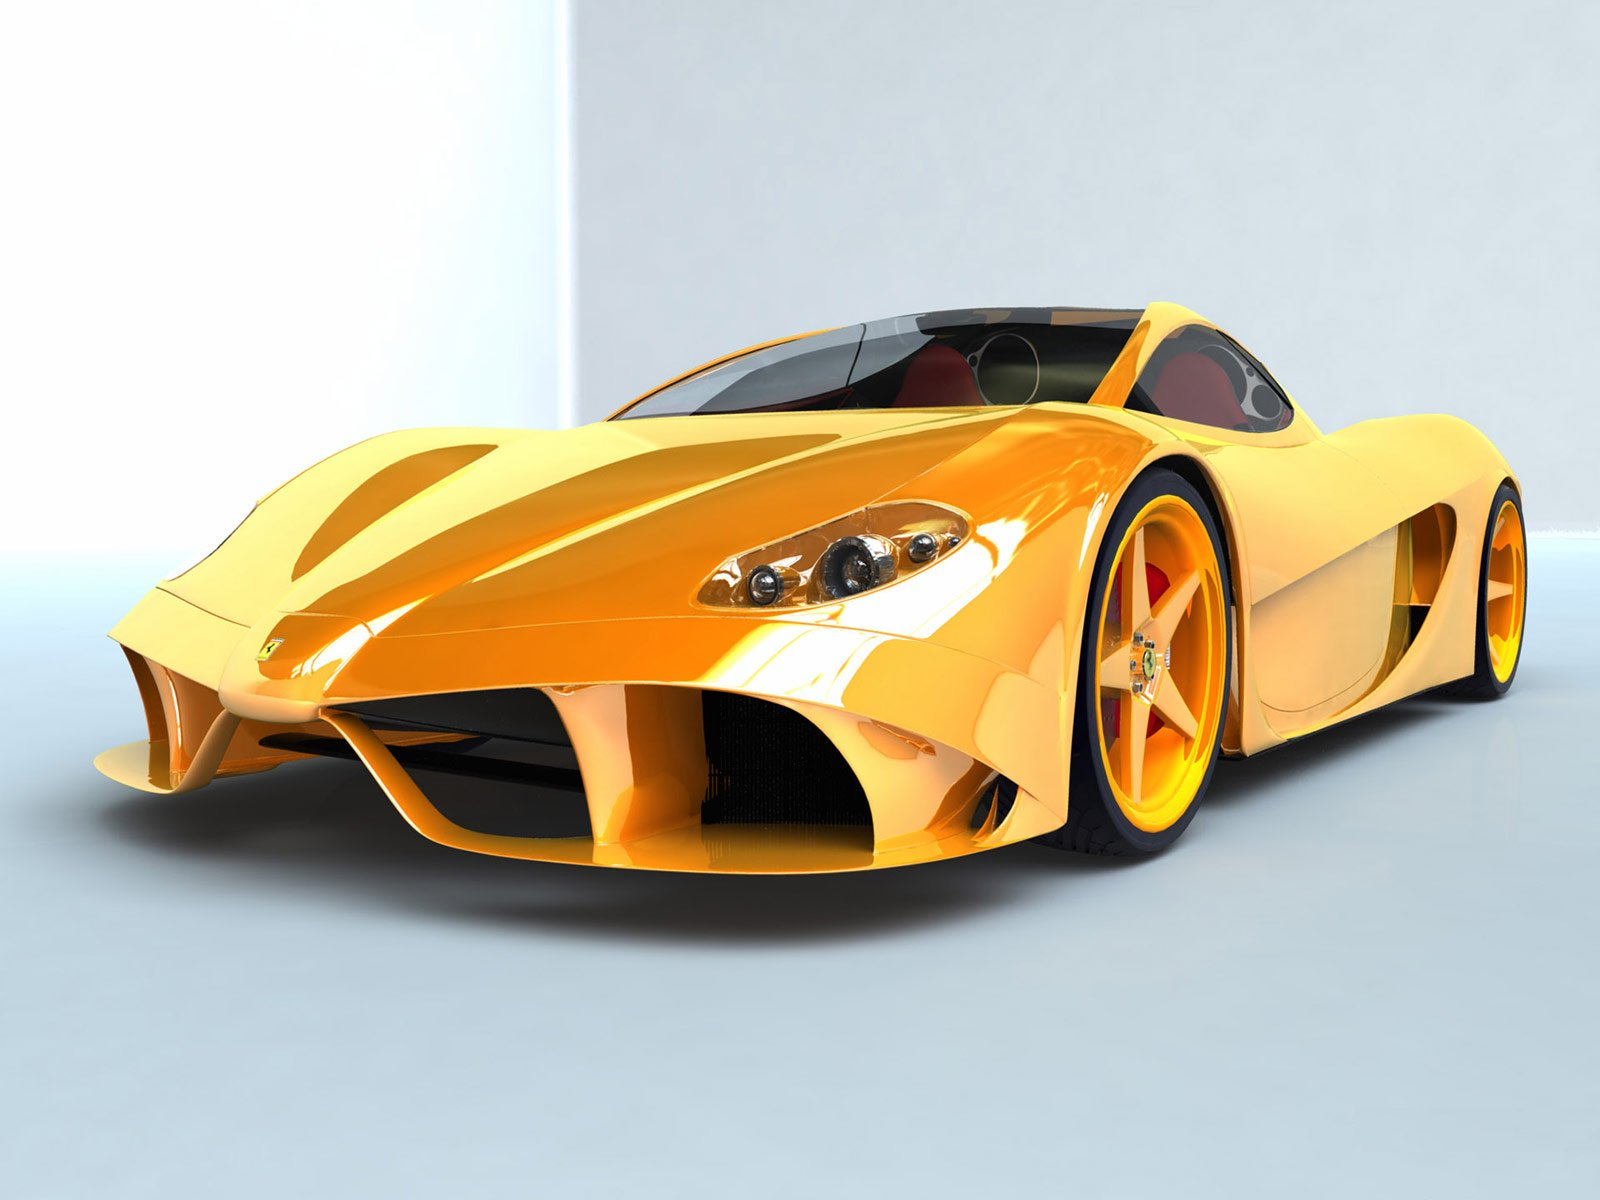 Exotic Vehicles: আজকের দুনিয়া: Exotic Racing Cars